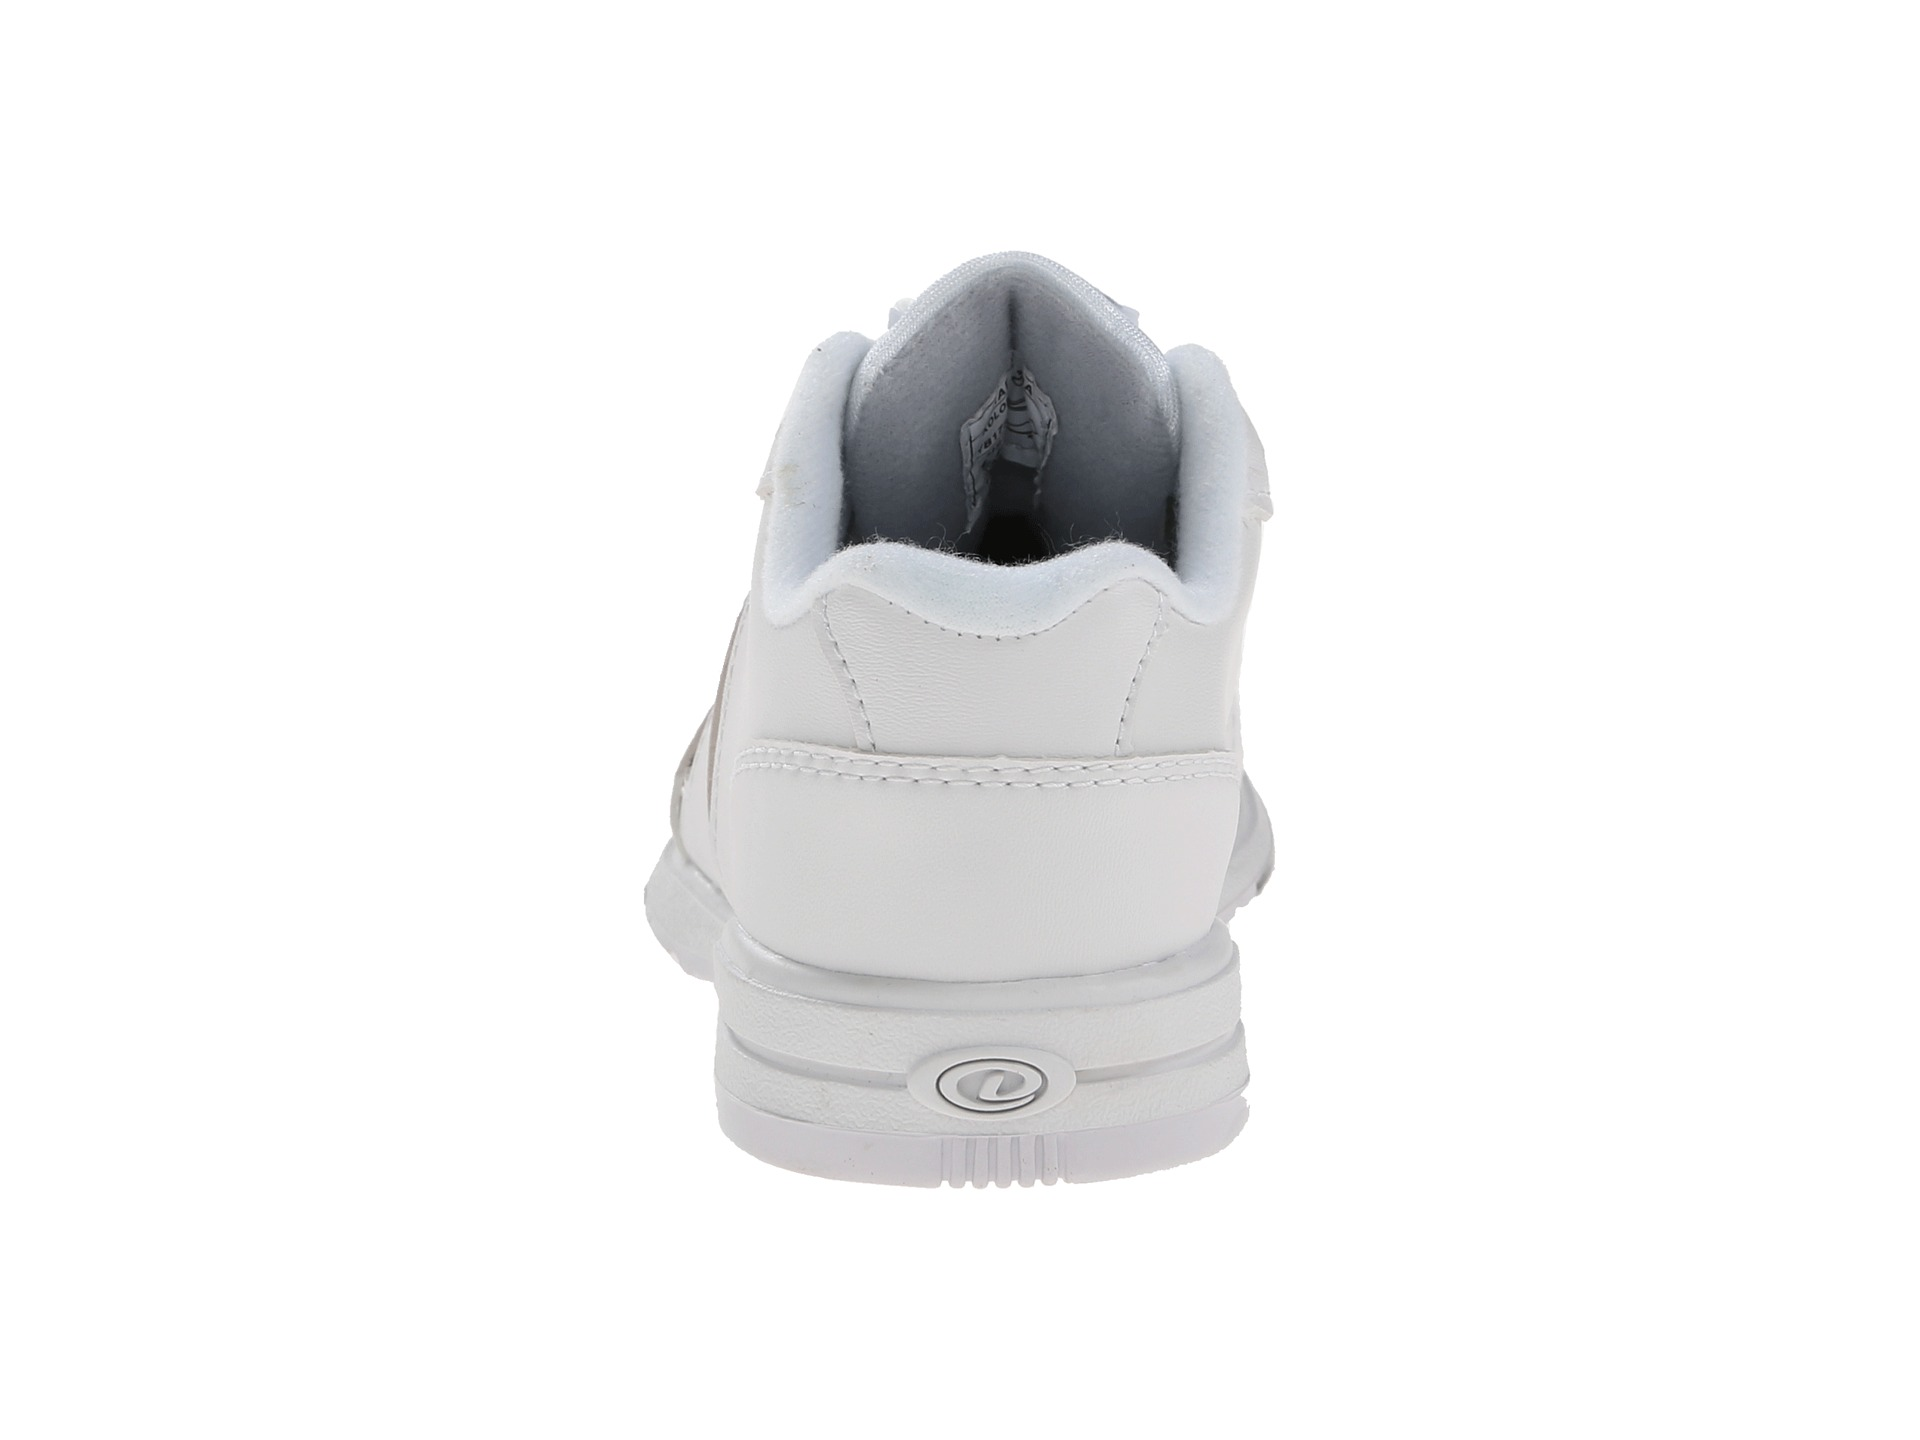 Narrow Size Bowling Shoes